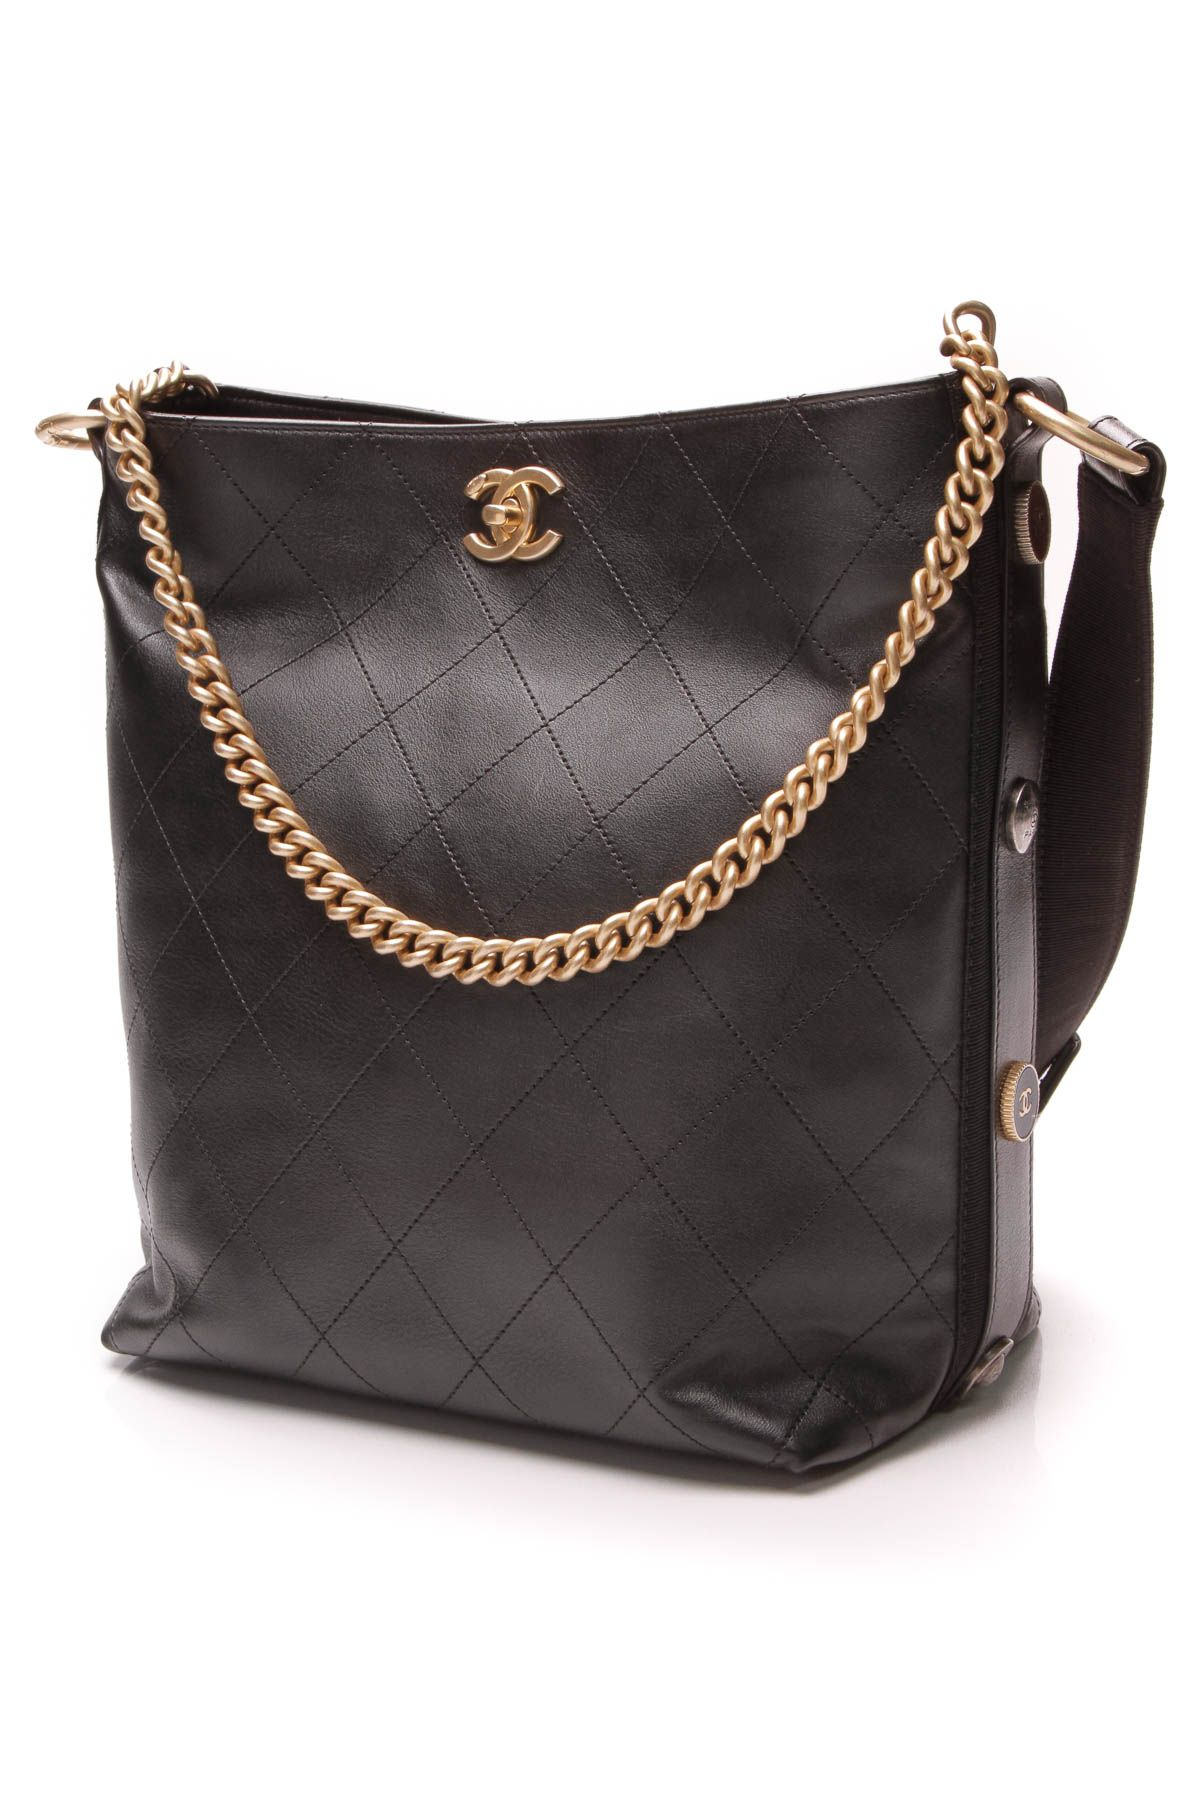 ffdc041920ddd8 Chain Hobo Bag - Calfskin in 2019 | Crazy for Coco | Handbags, Bags ...